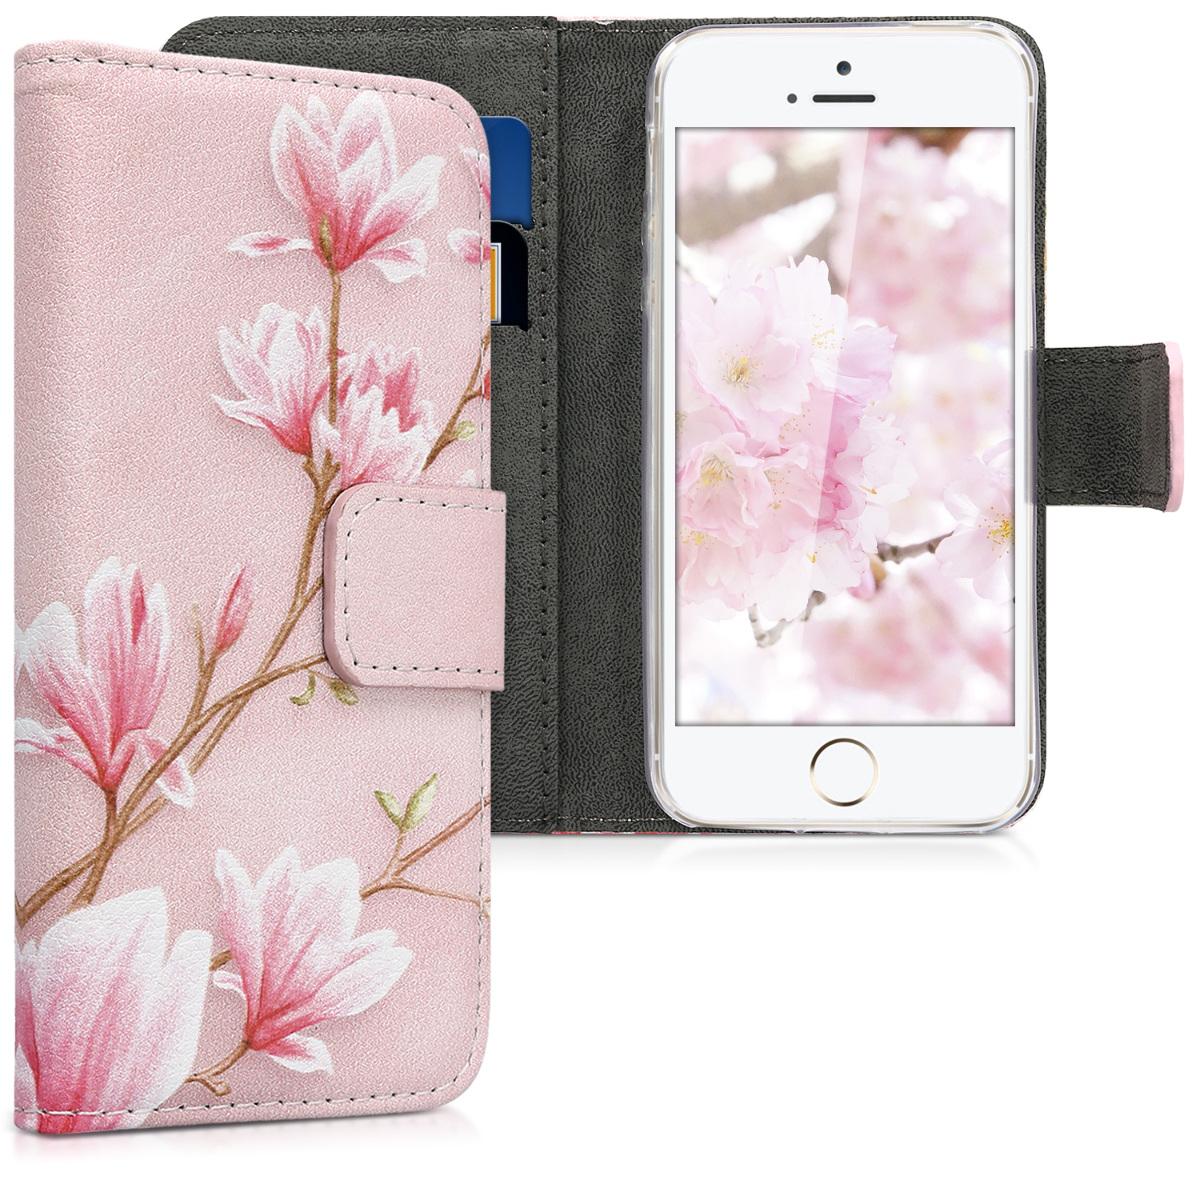 KW Θήκη - Πορτοφόλι iPhone SE / 5S / 5 - Light Pink / White / Antique Pink (20207.22)